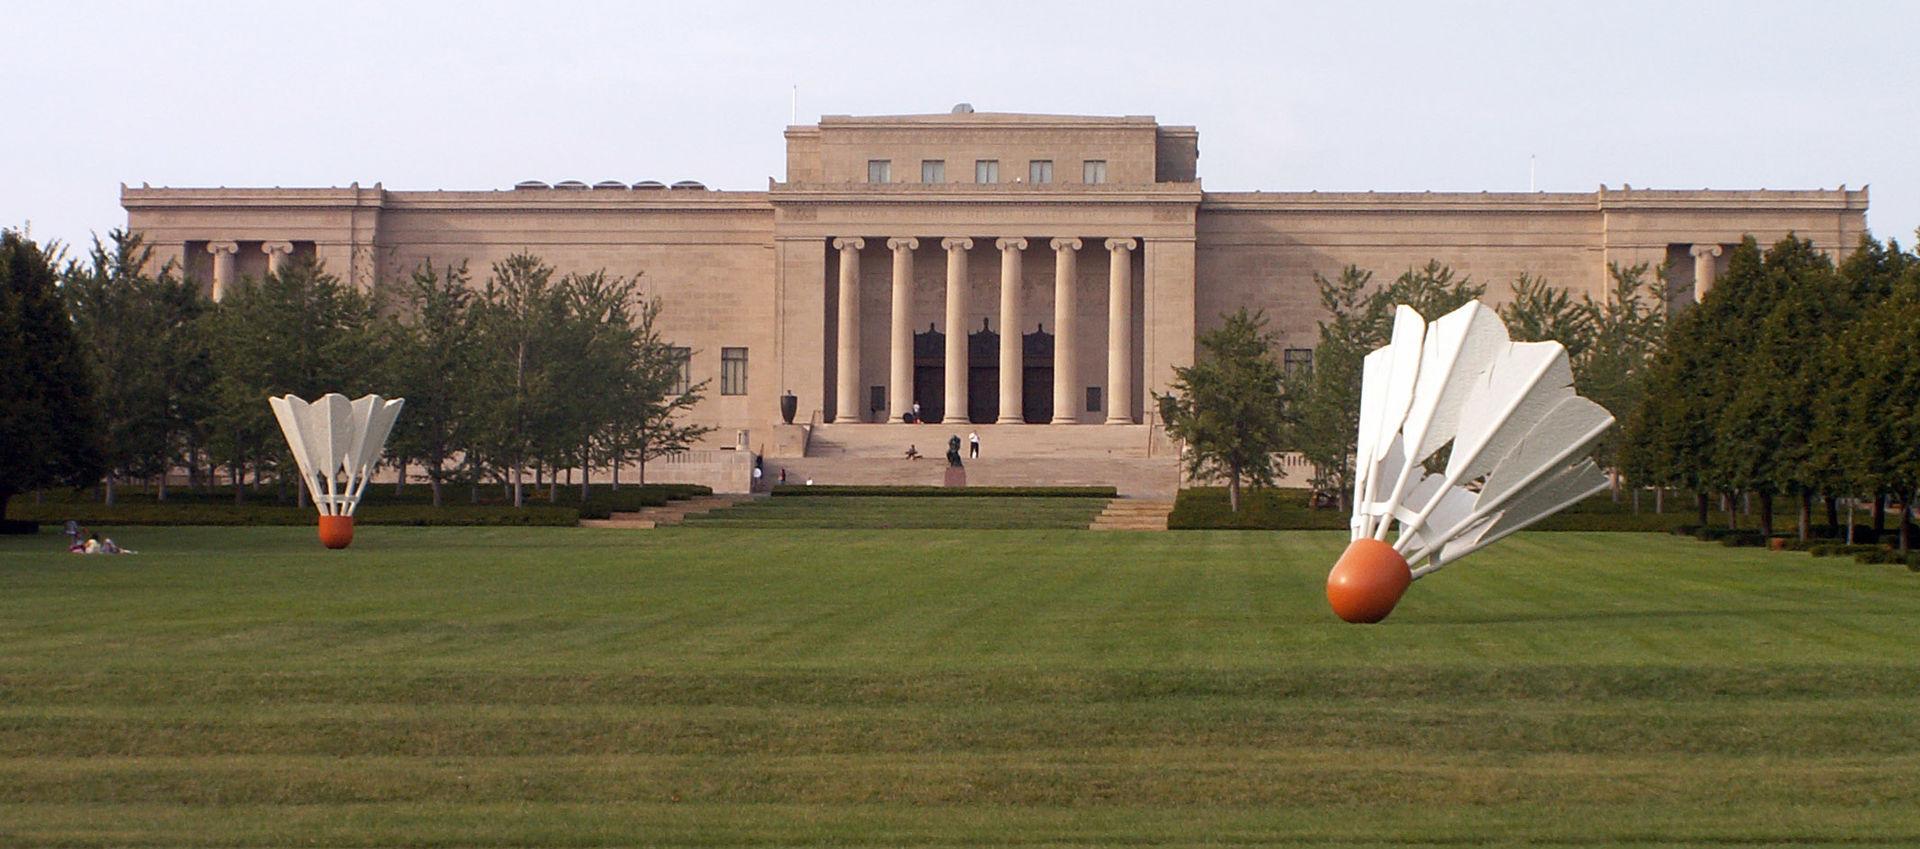 Nelson Atkins Art Museum